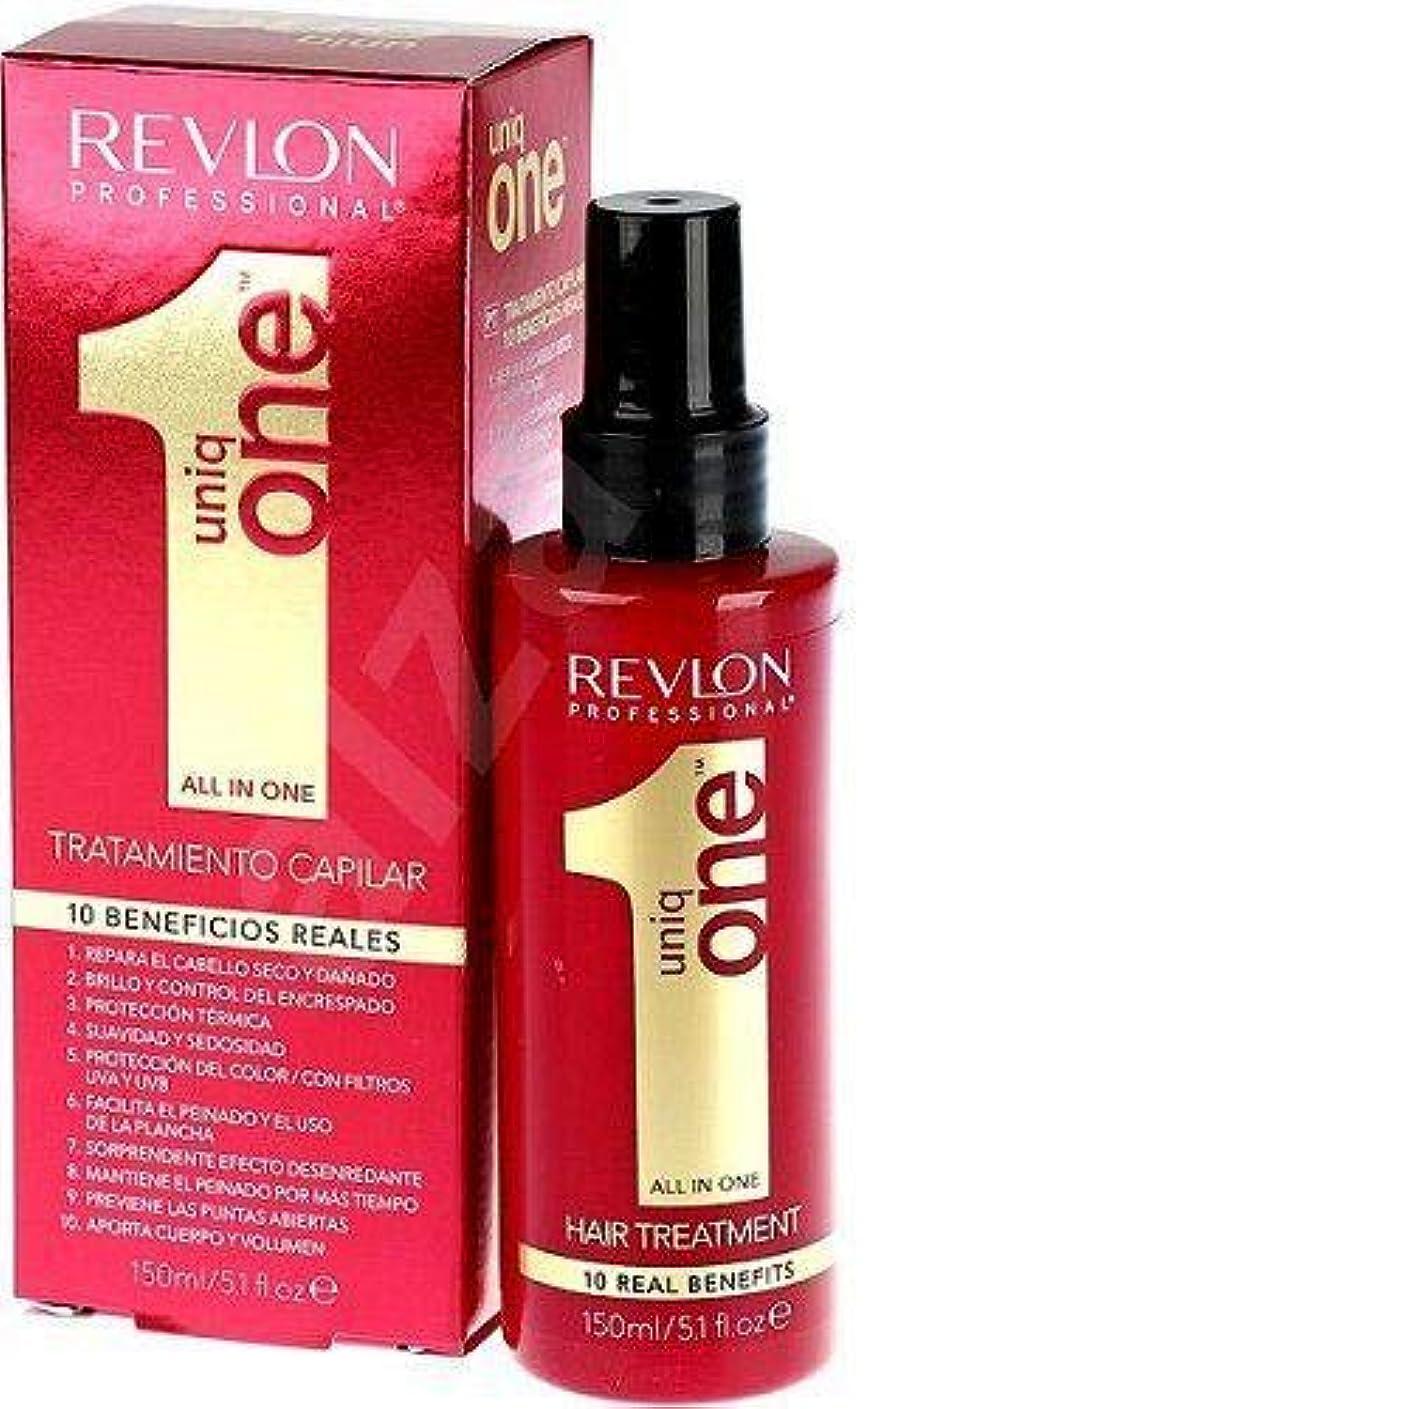 UNIQ ONE All in one hair treatment 150 ml